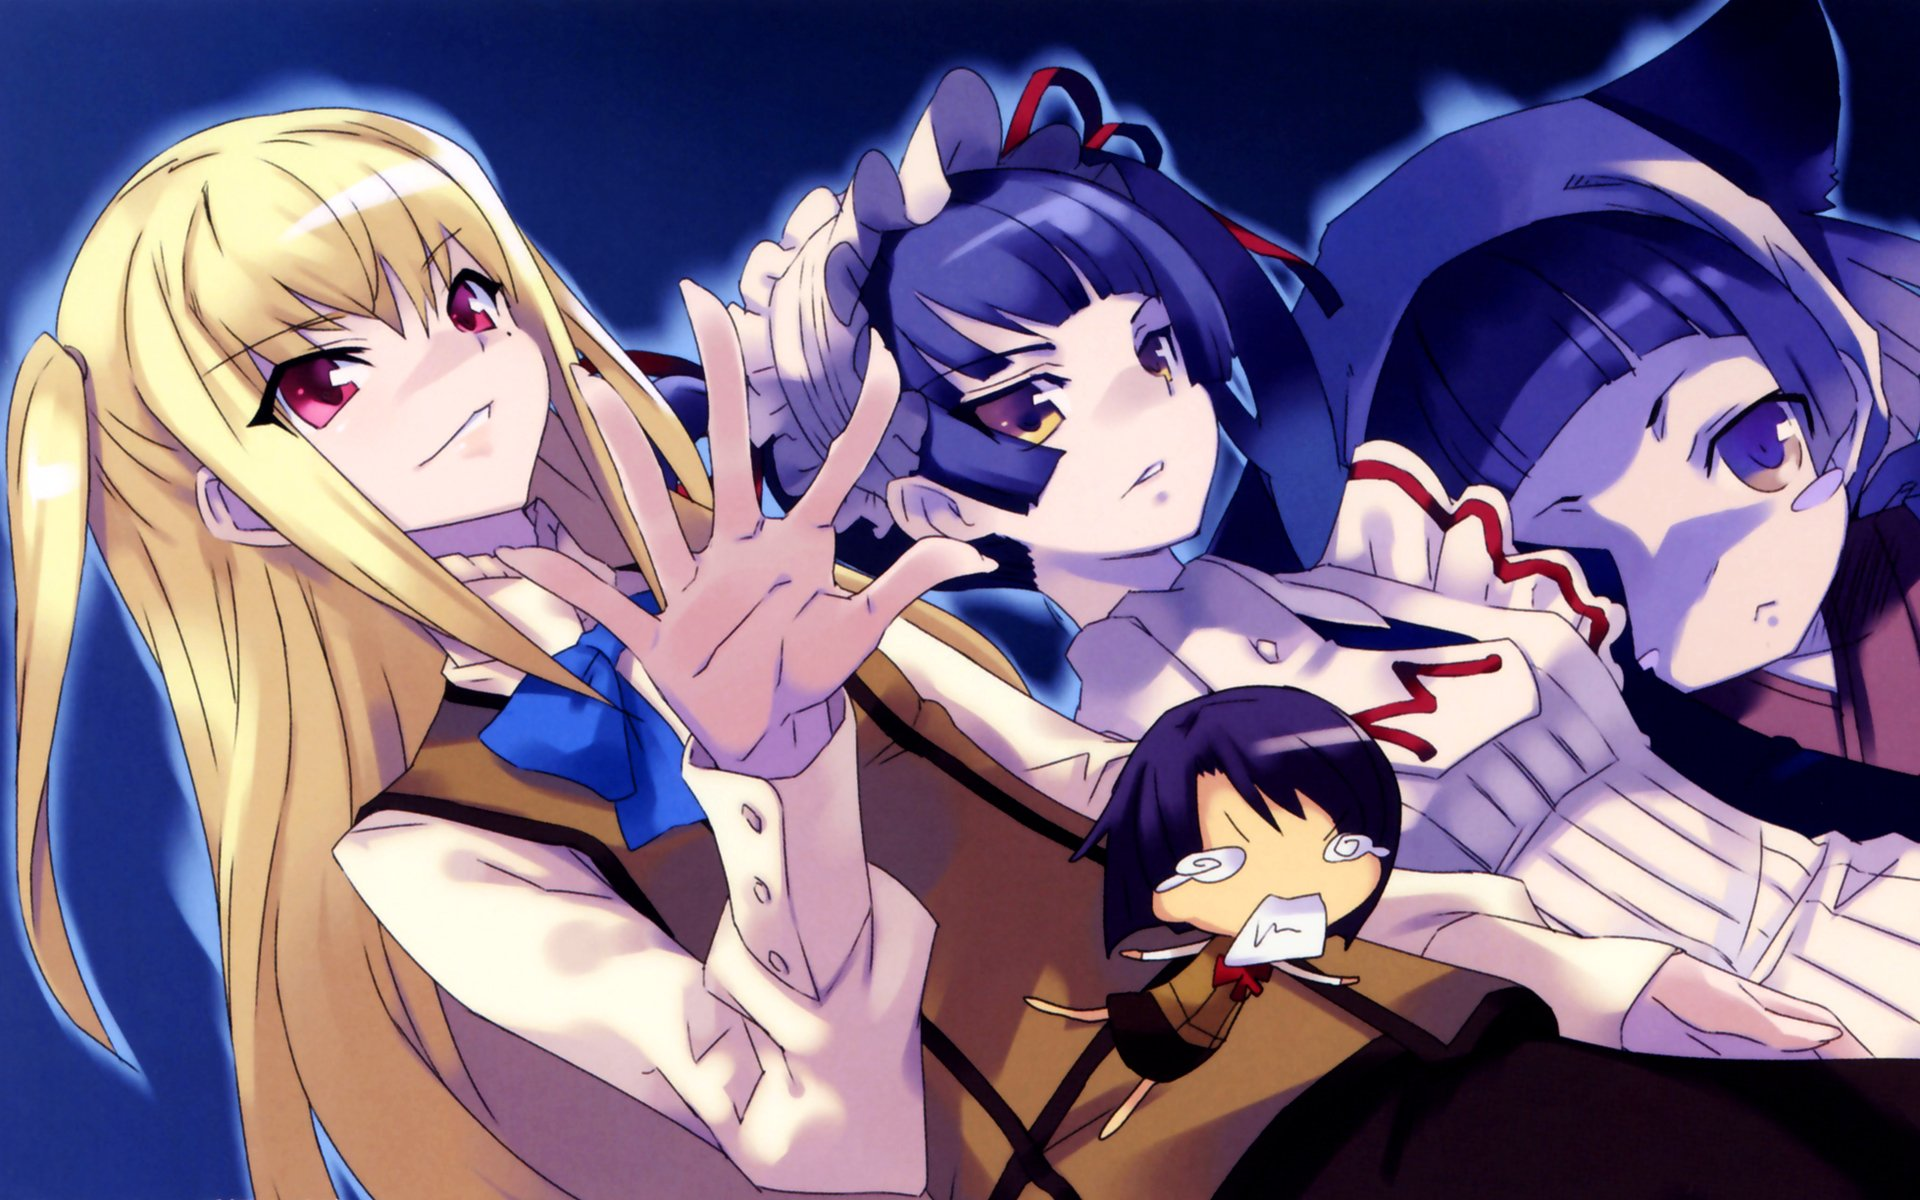 Anime - Maria Holic  Wallpaper